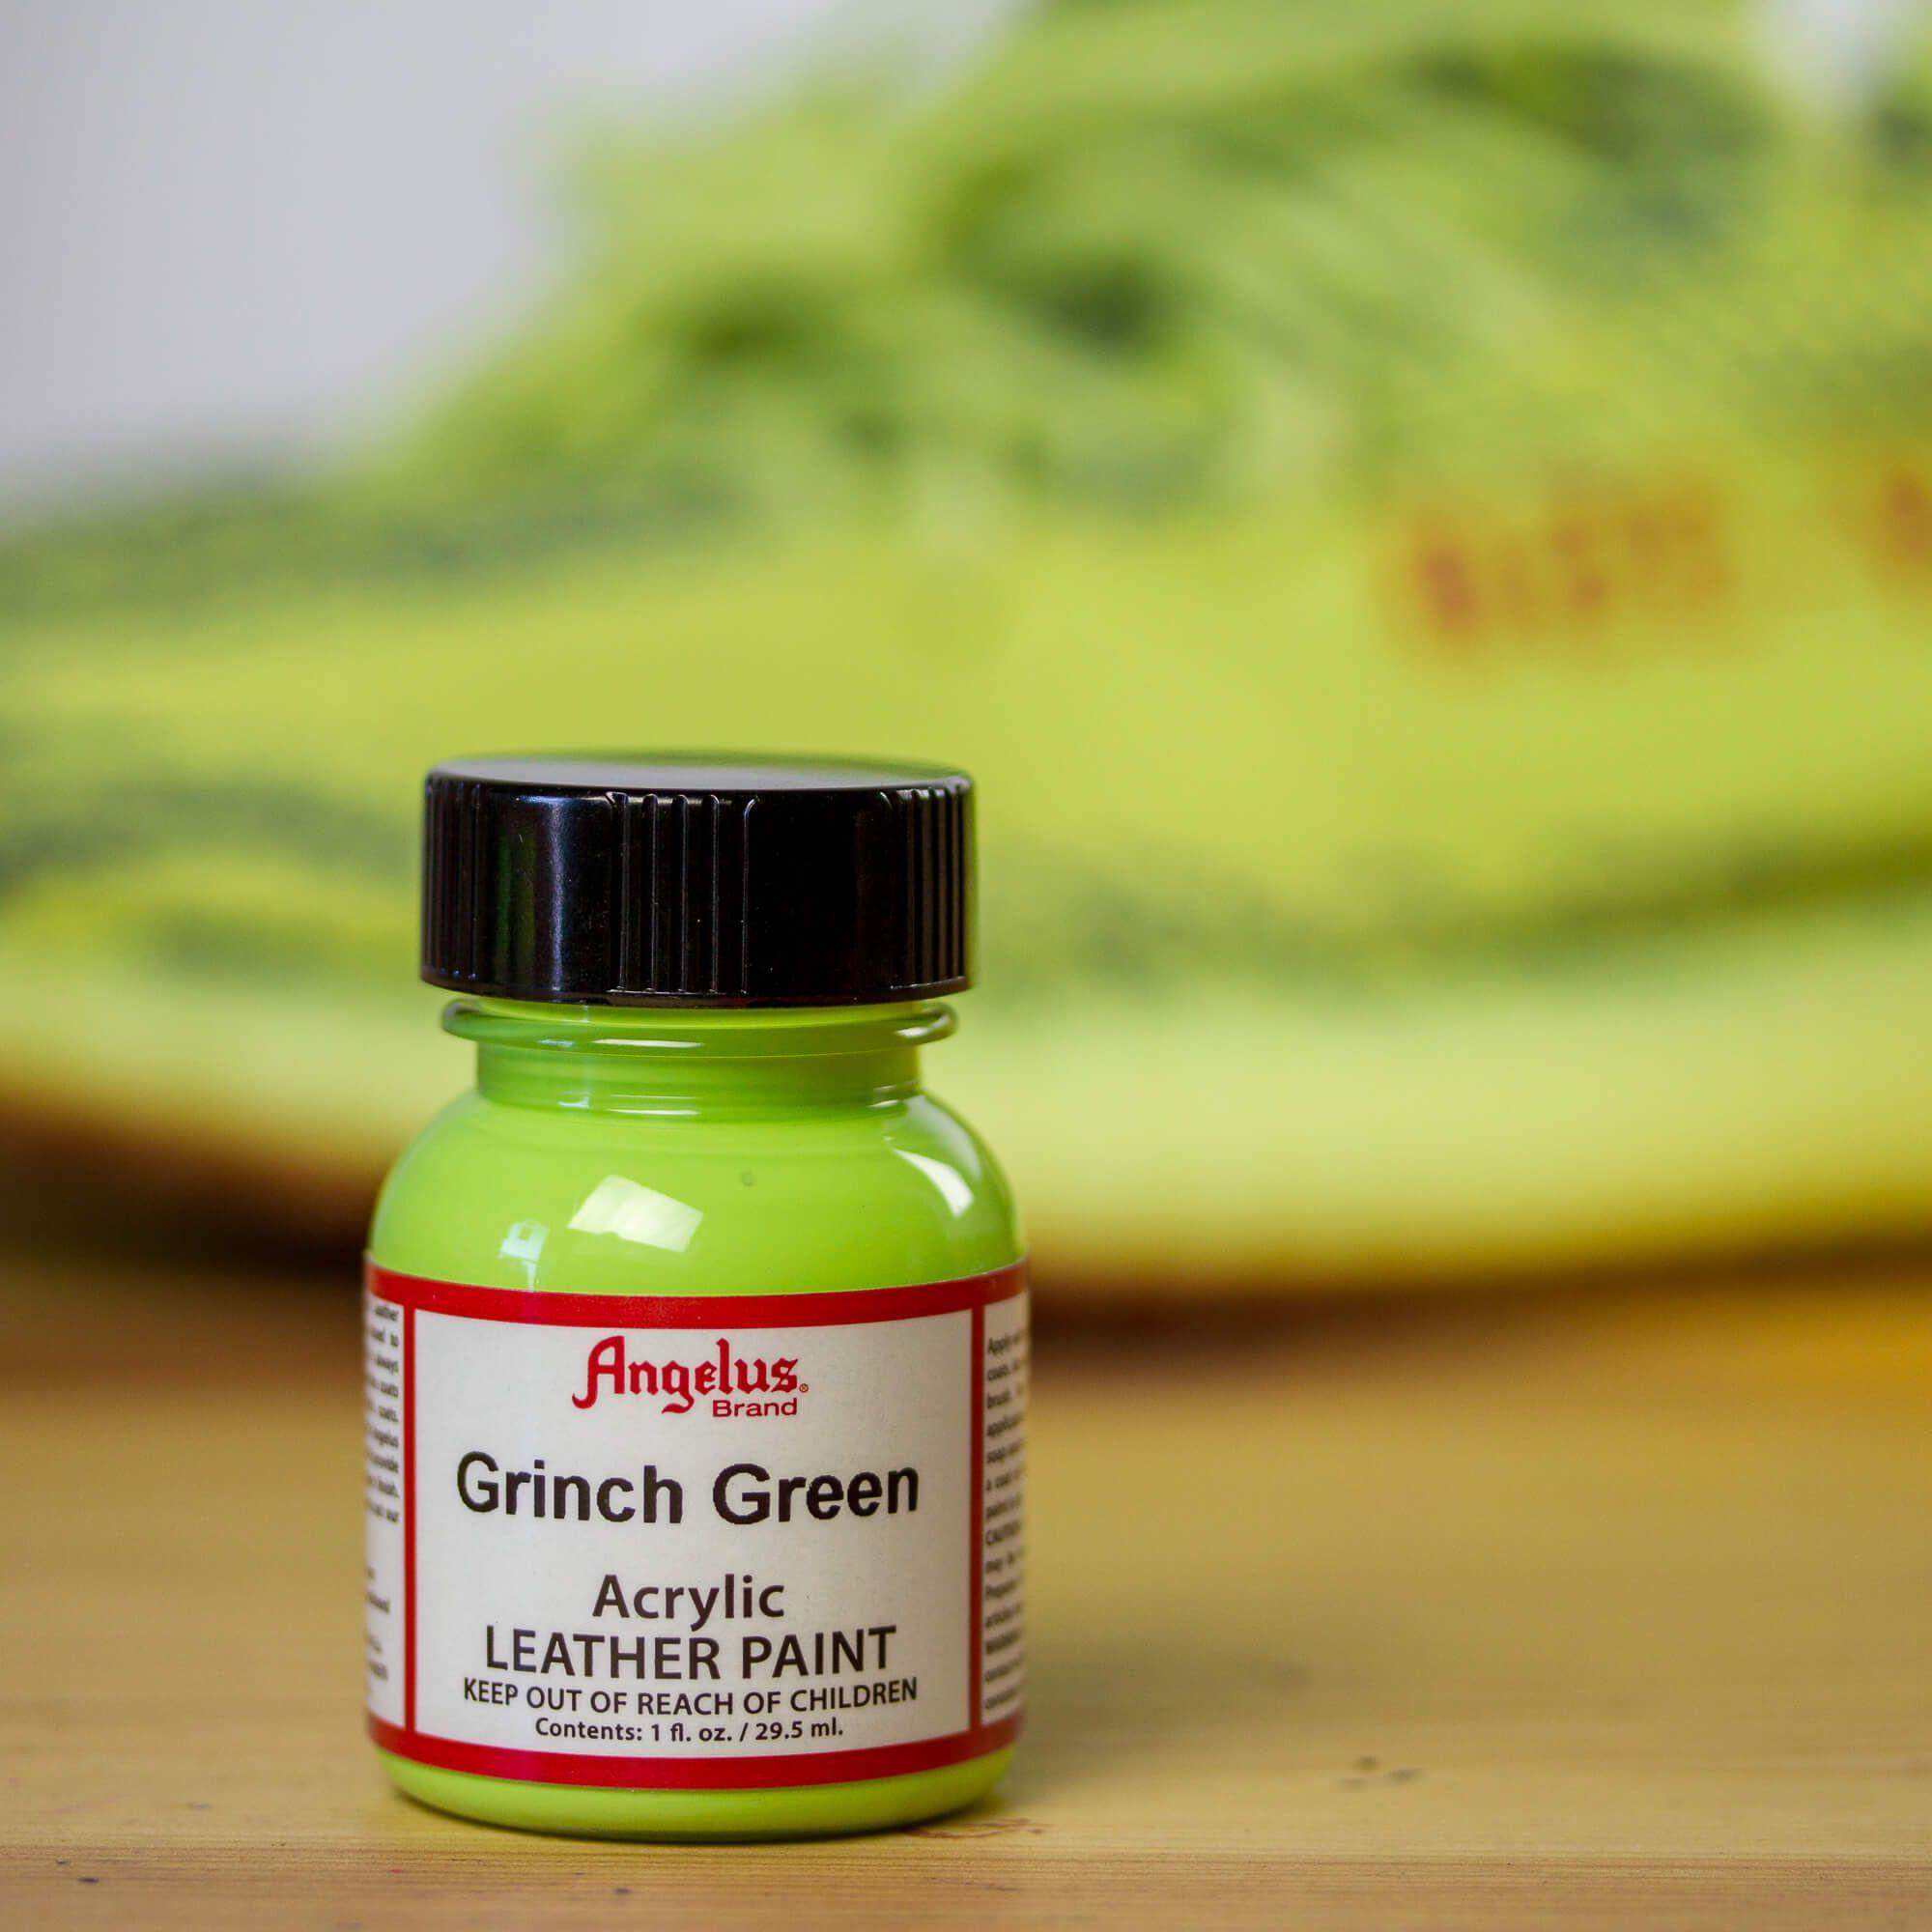 Angelus Grinch Green Paint | Green